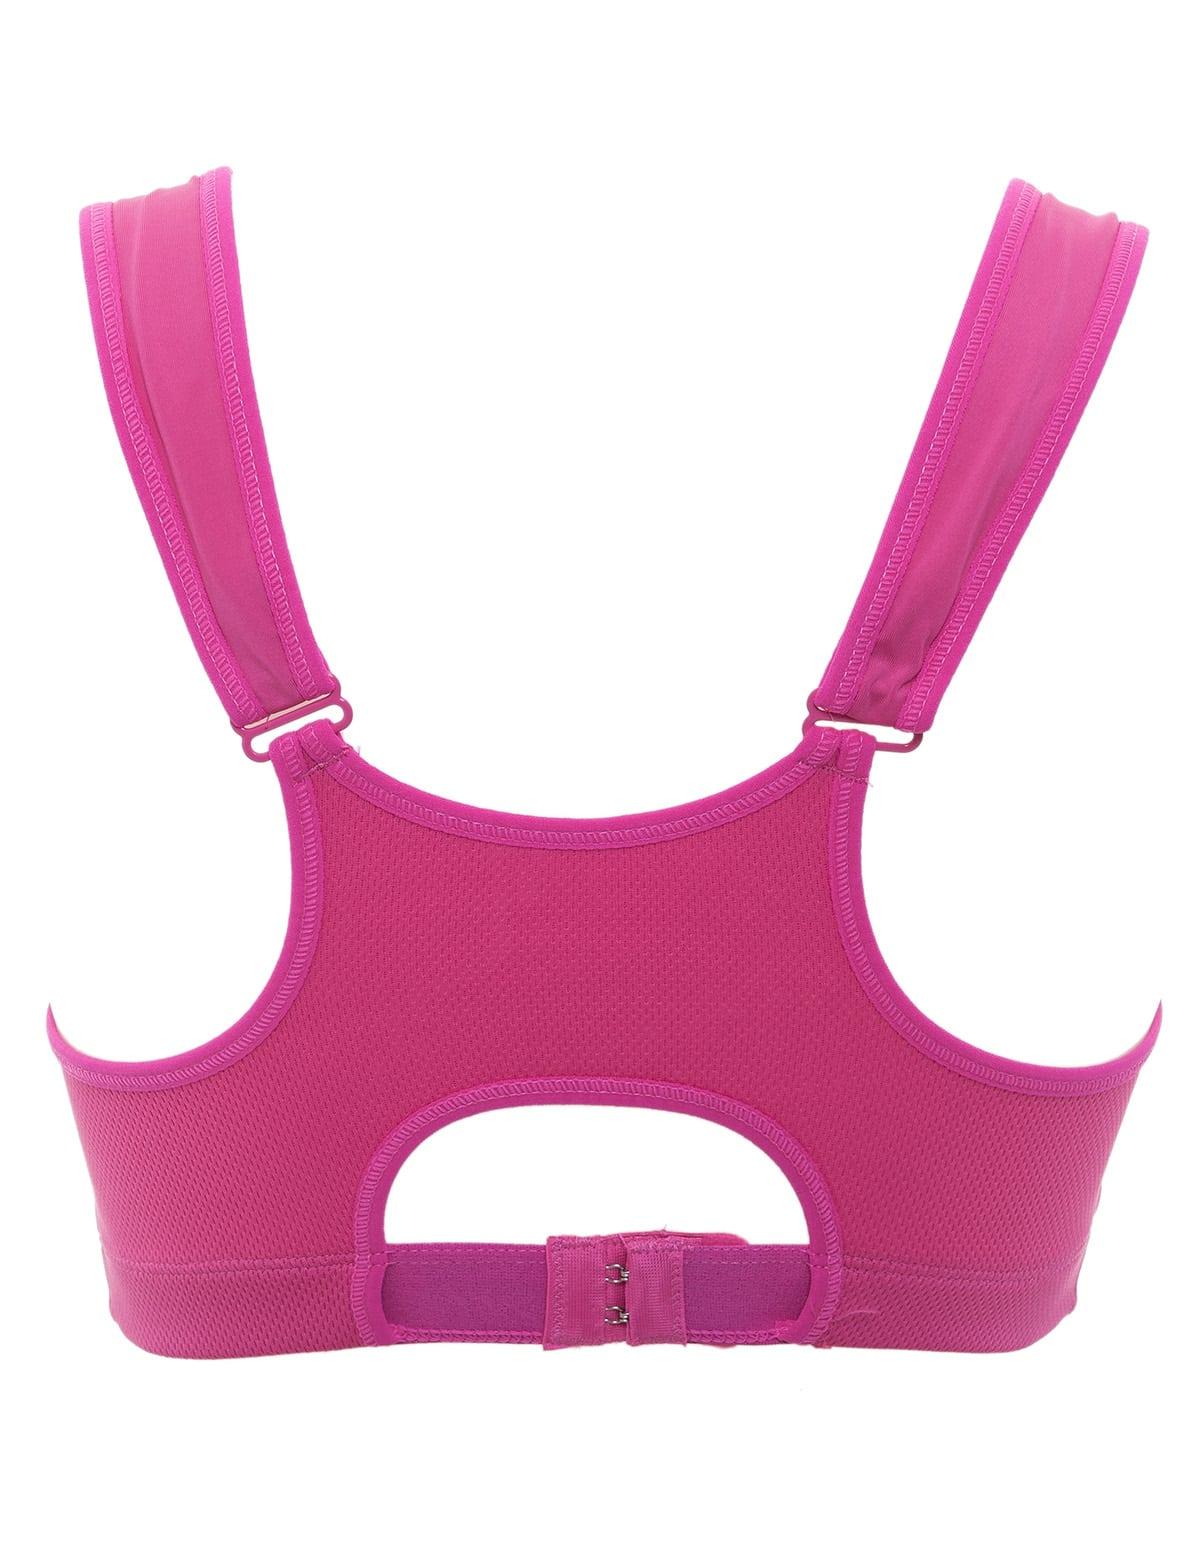 Home Γυναικεία Μπουστάκια Αθλητικά Γυναικείο αθλητικό μπουστάκι σε φούξια  χρώμα 036ca02cb0b